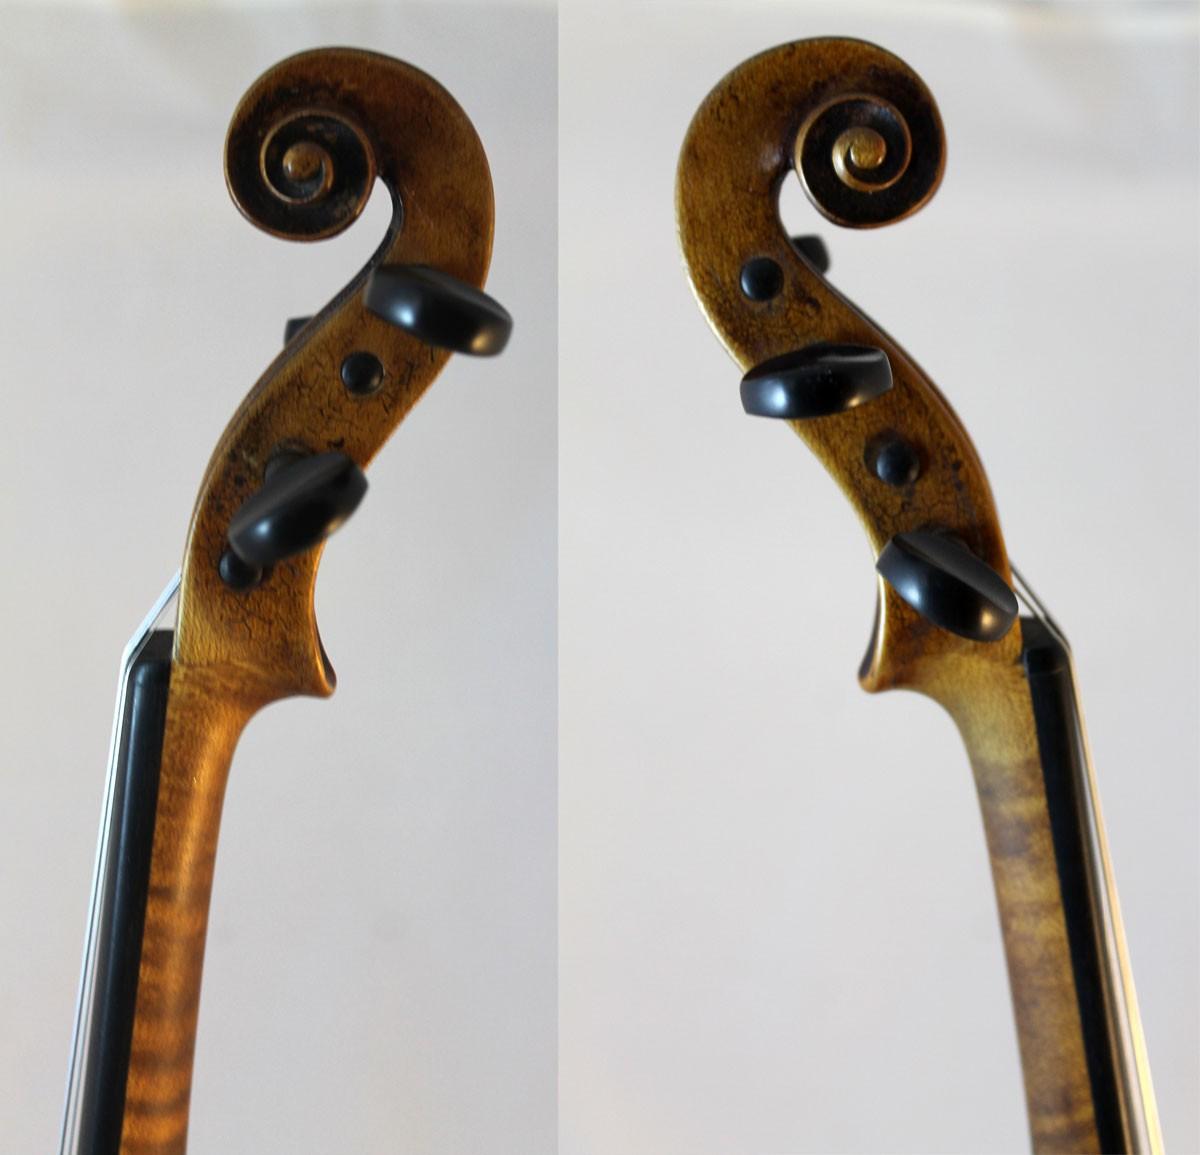 Amati violin for sale - scroll